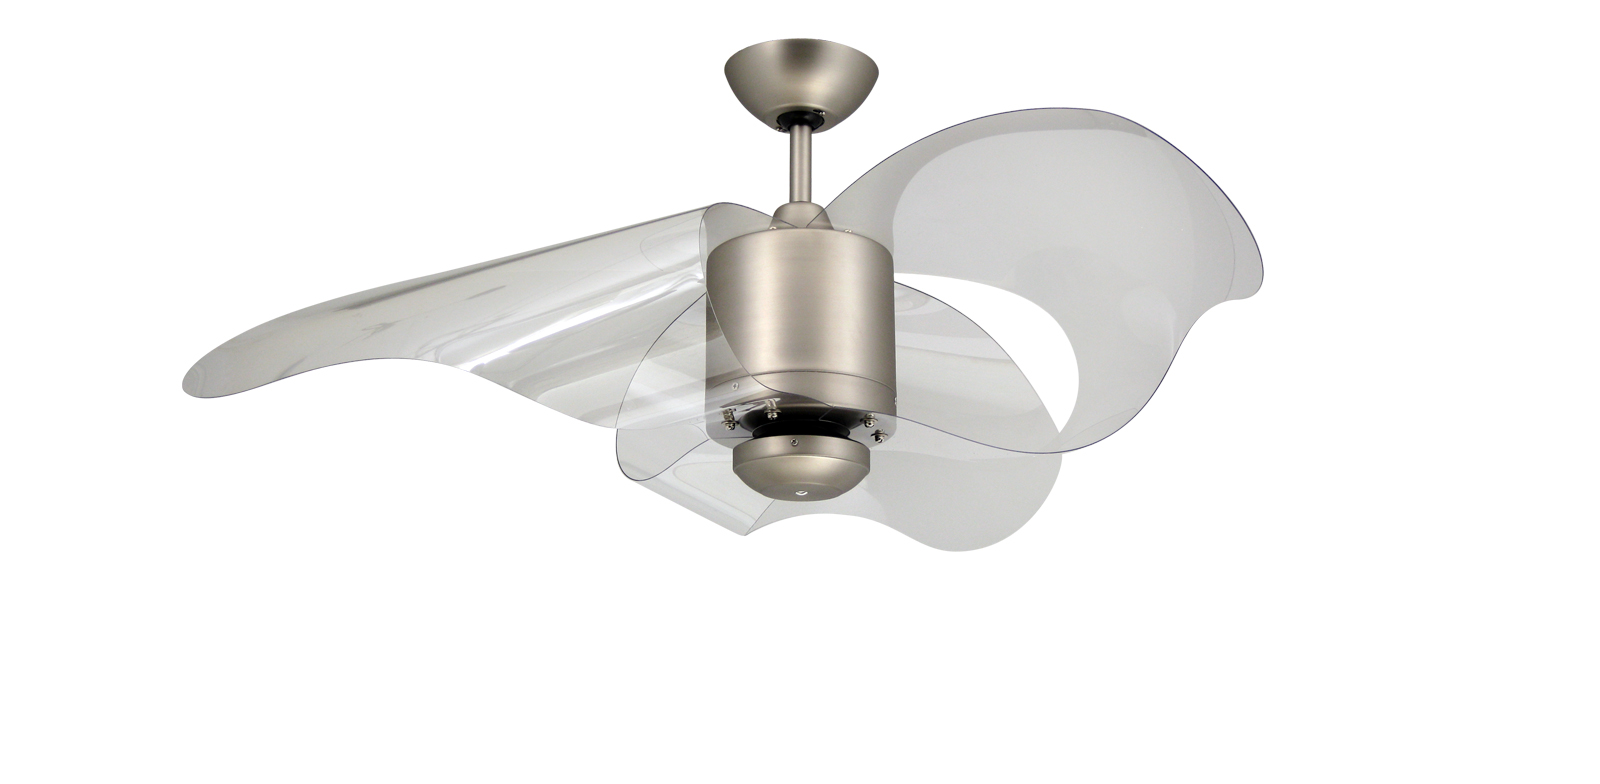 Blyss ceiling fan manual integralbook blyss ceiling fan manual integralbook com mozeypictures Gallery